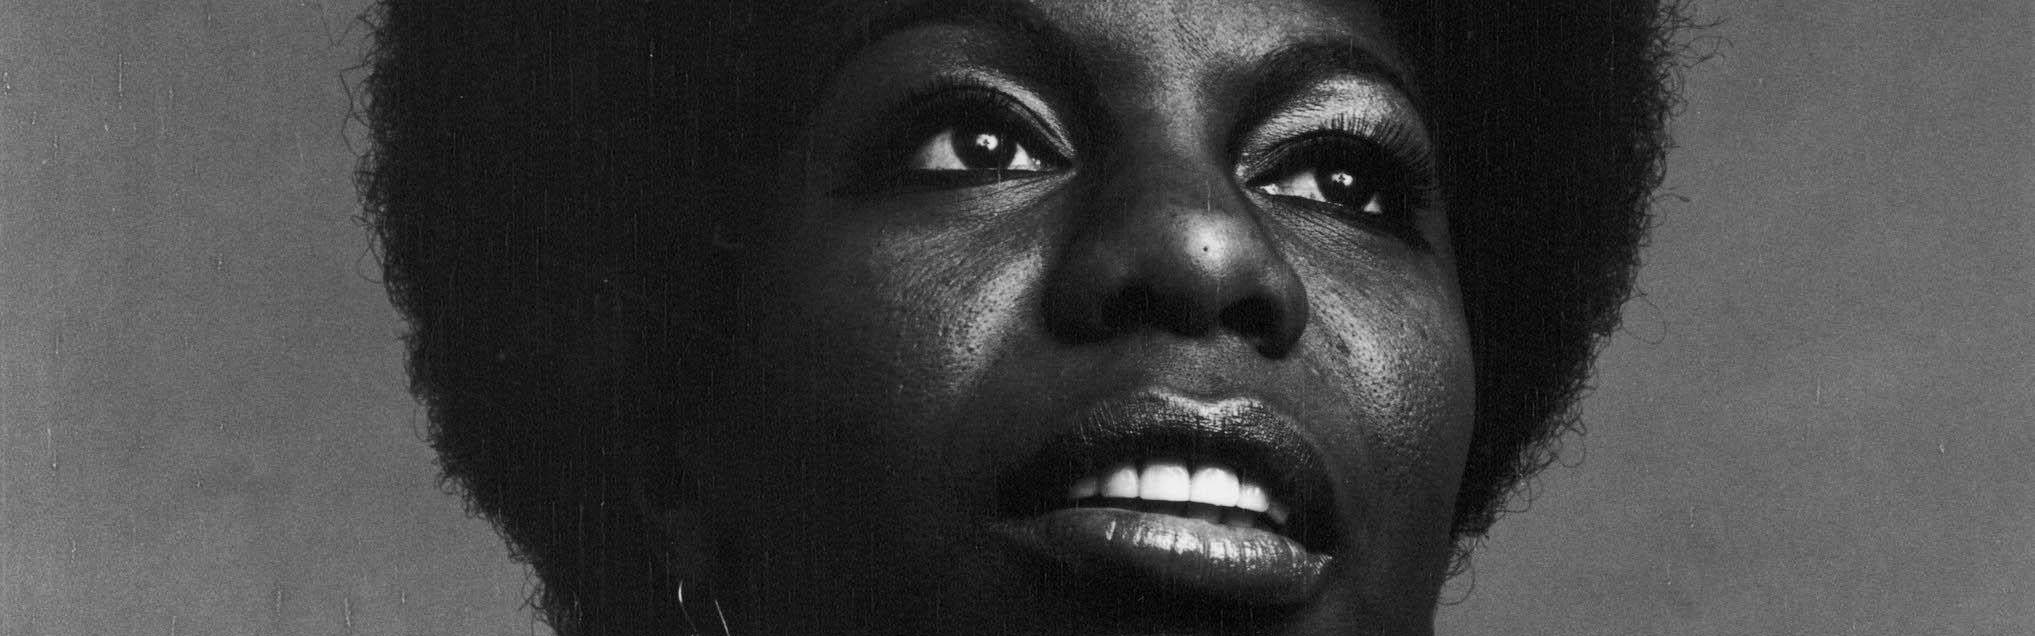 nina simone fot Jack Robinson/Hulton Archive - Getty Images